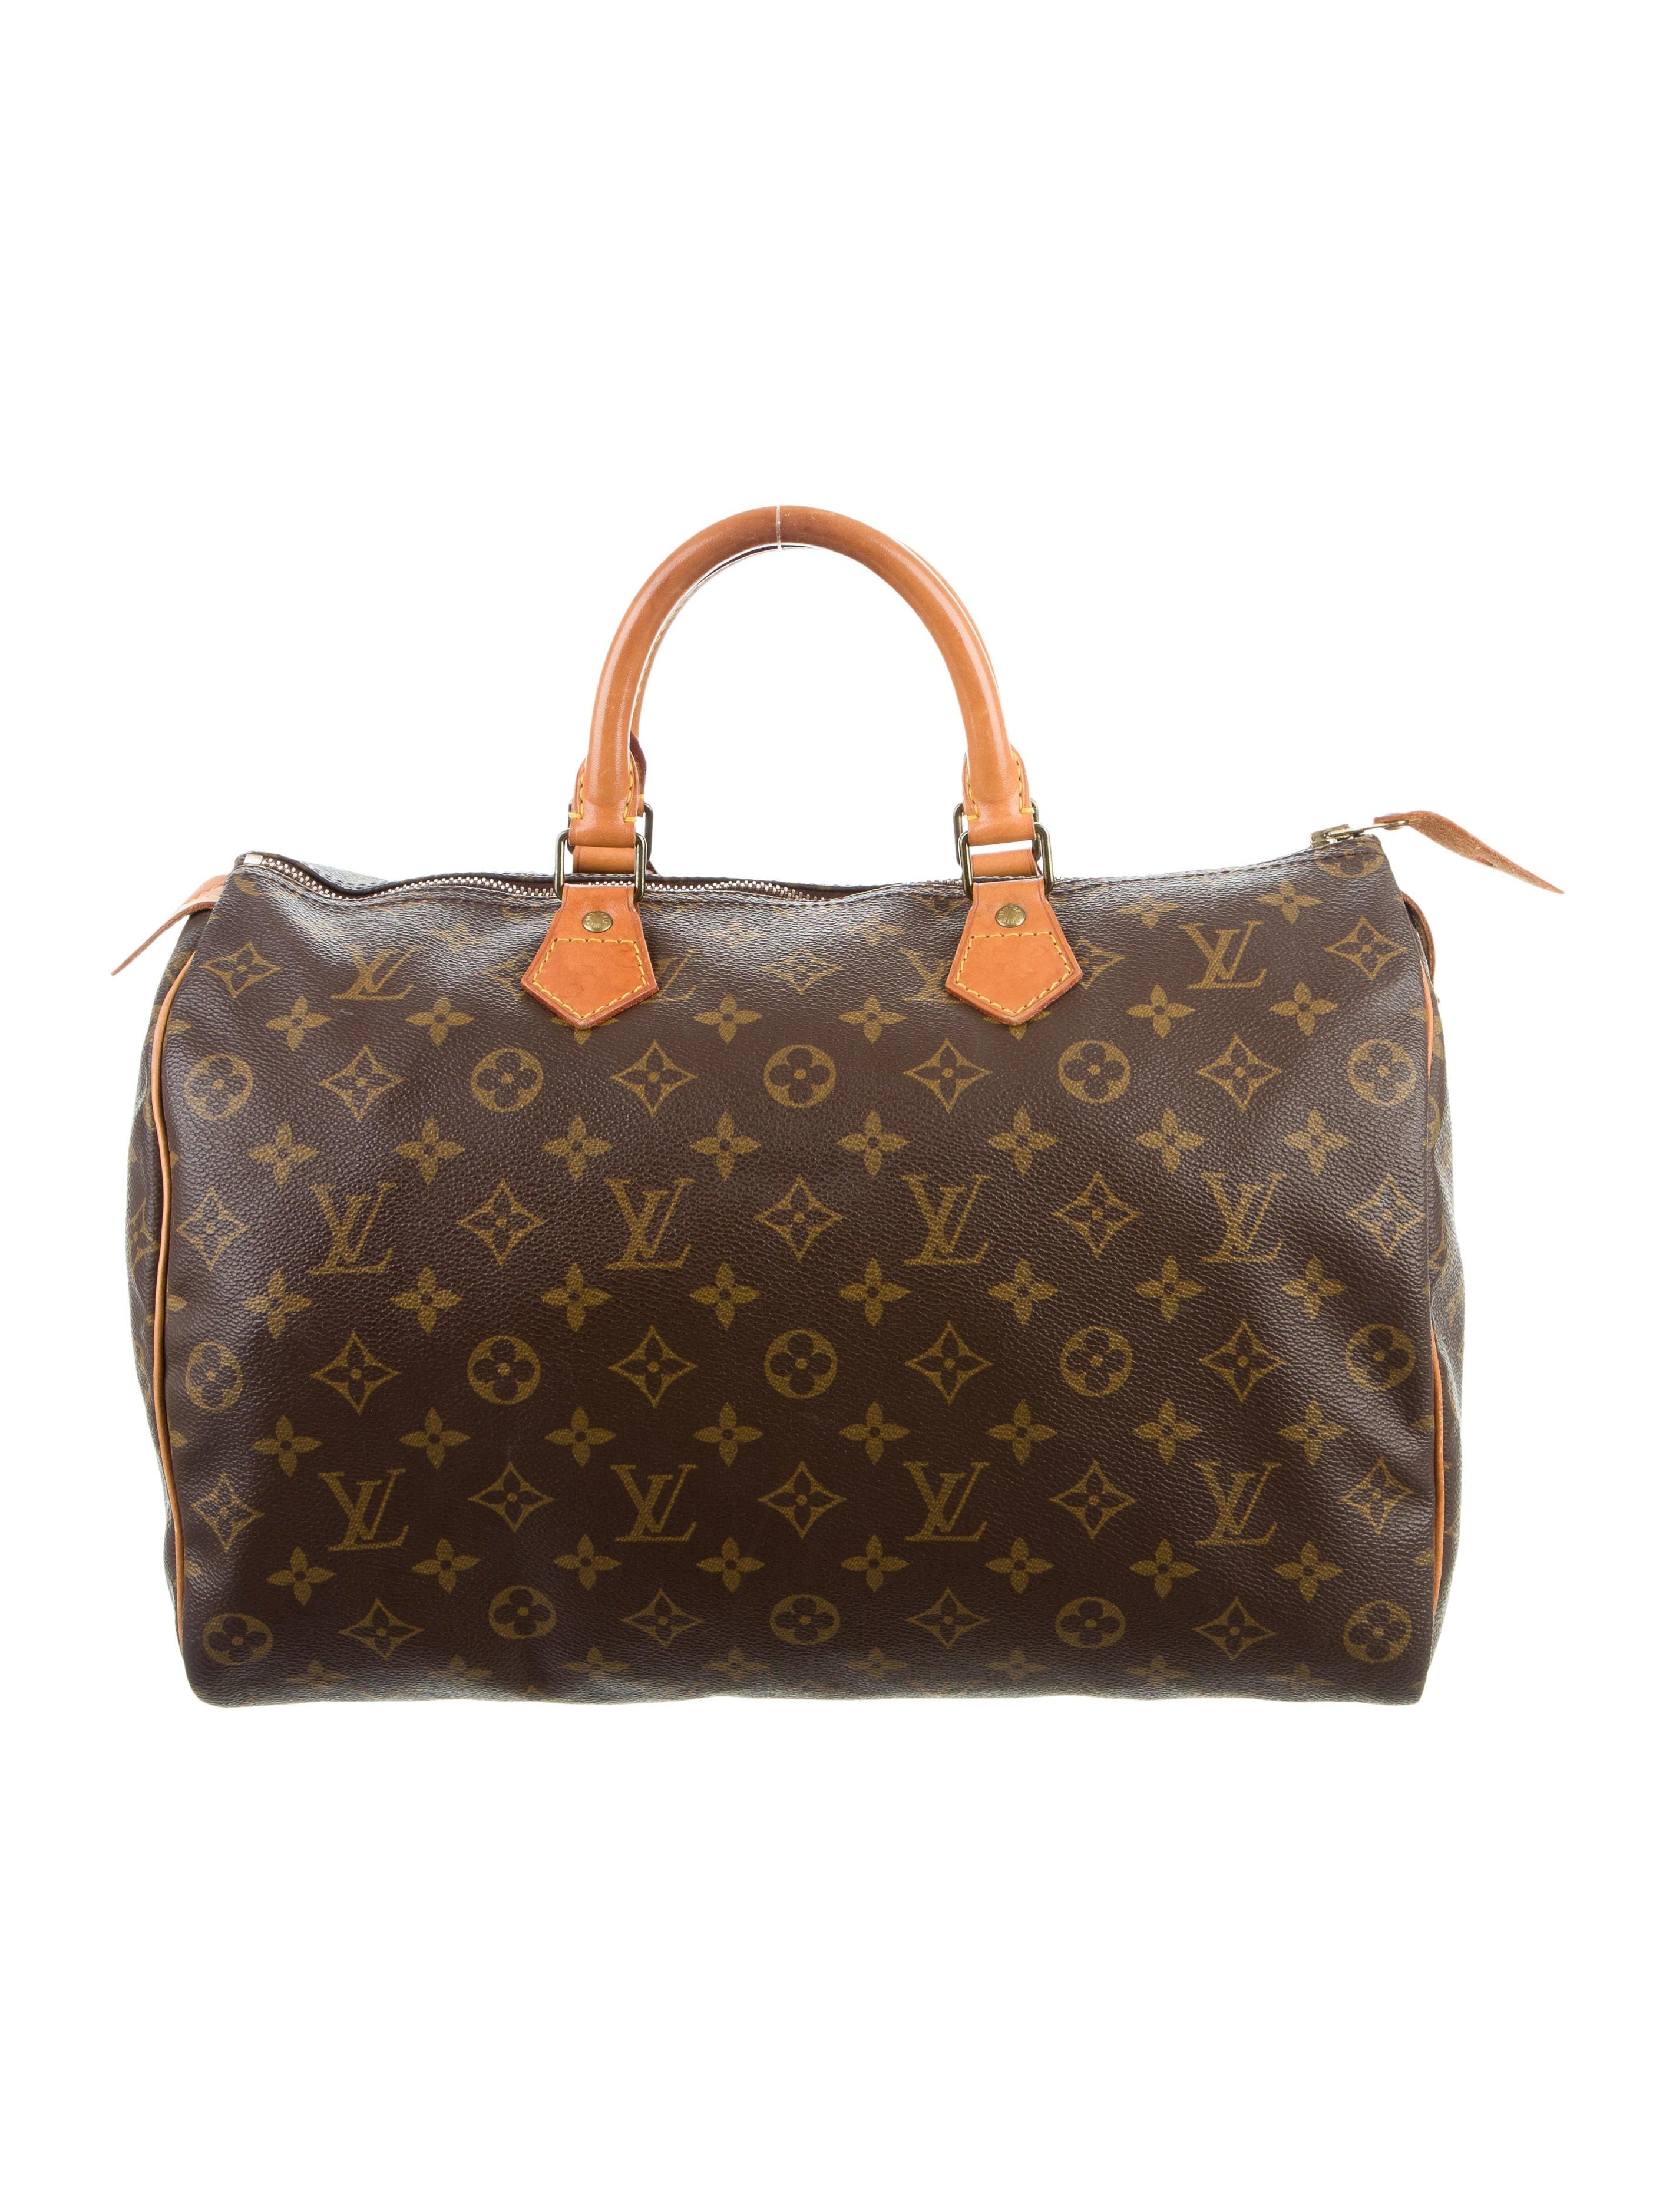 louis vuitton monogram speedy 35 handbags lou120904 the realreal. Black Bedroom Furniture Sets. Home Design Ideas